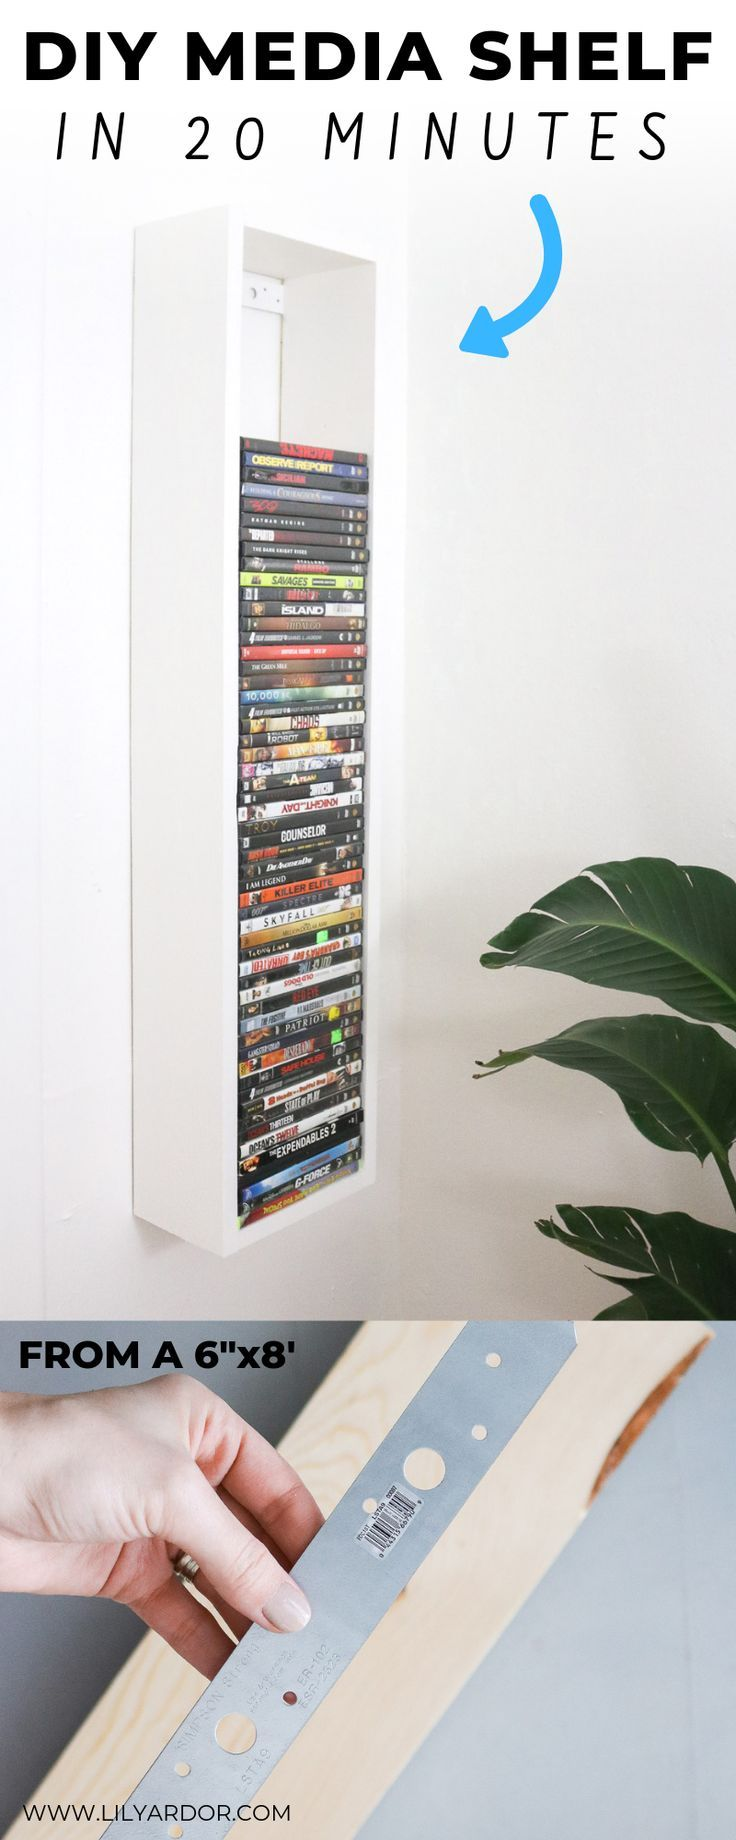 List of Best DIY Shelves from lilyardor.com